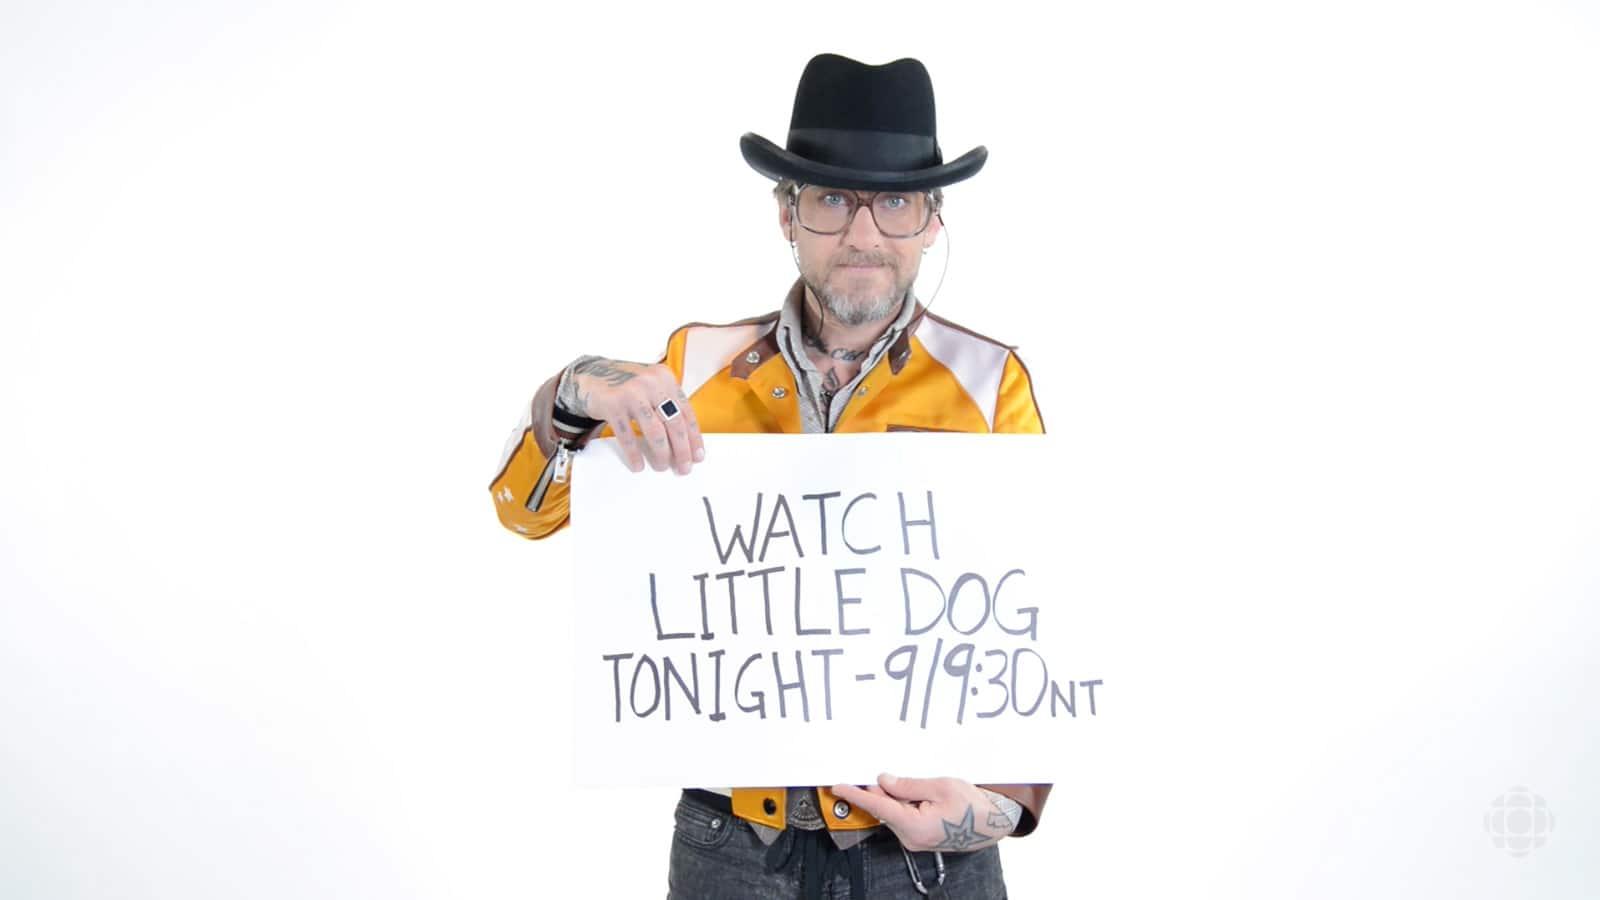 Watch Little Dog tonight!